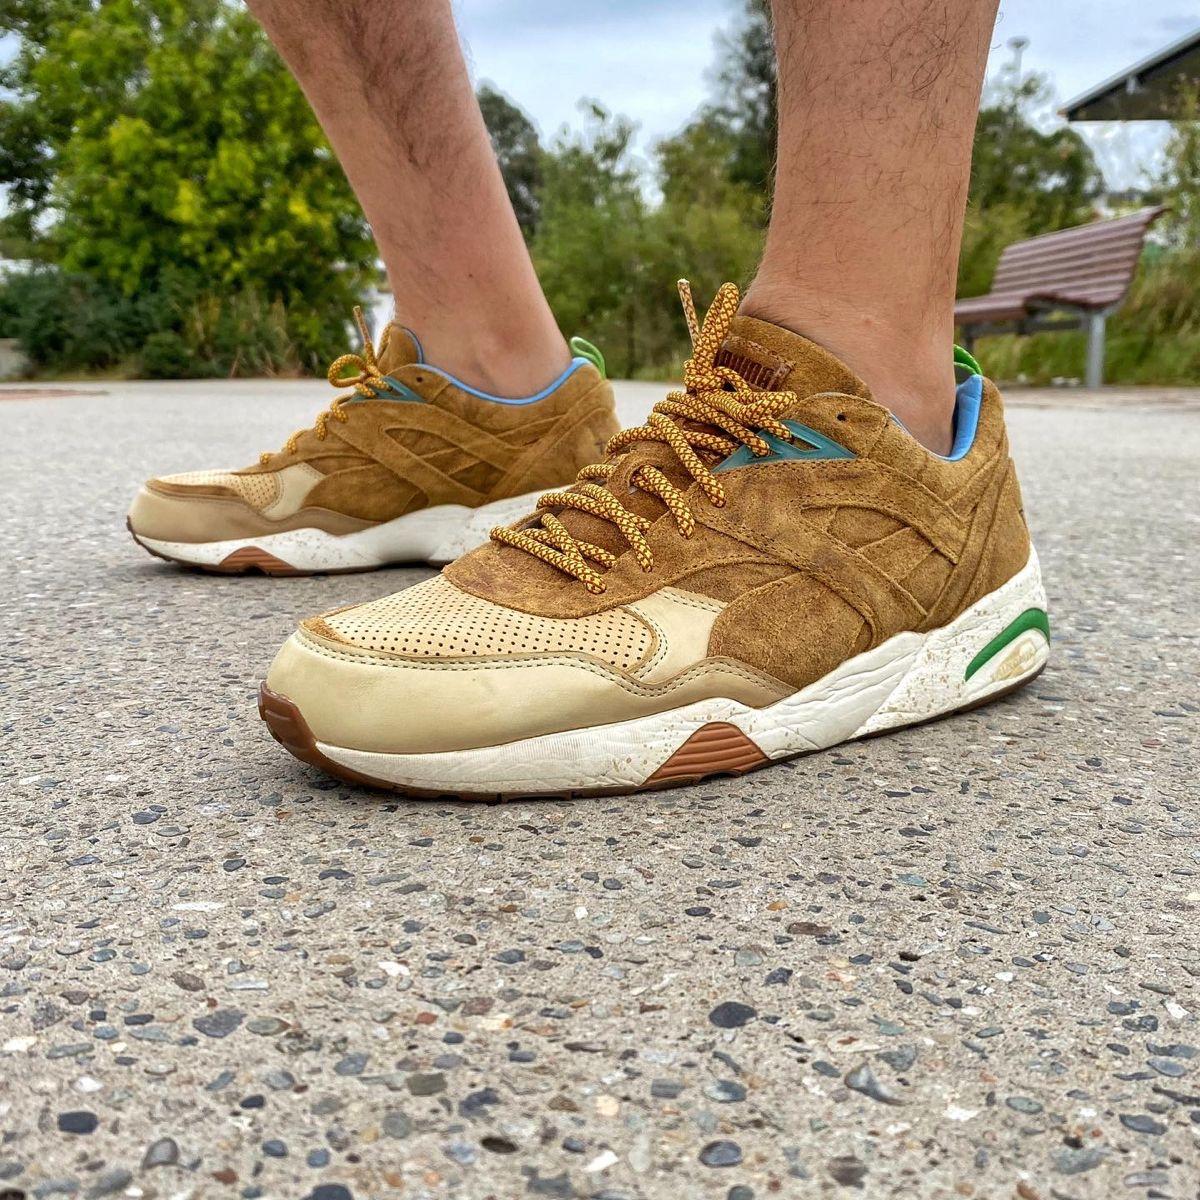 260 Sneakers: Puma Trinomic R698 ideas in 2021 | sneakers, puma, pumas